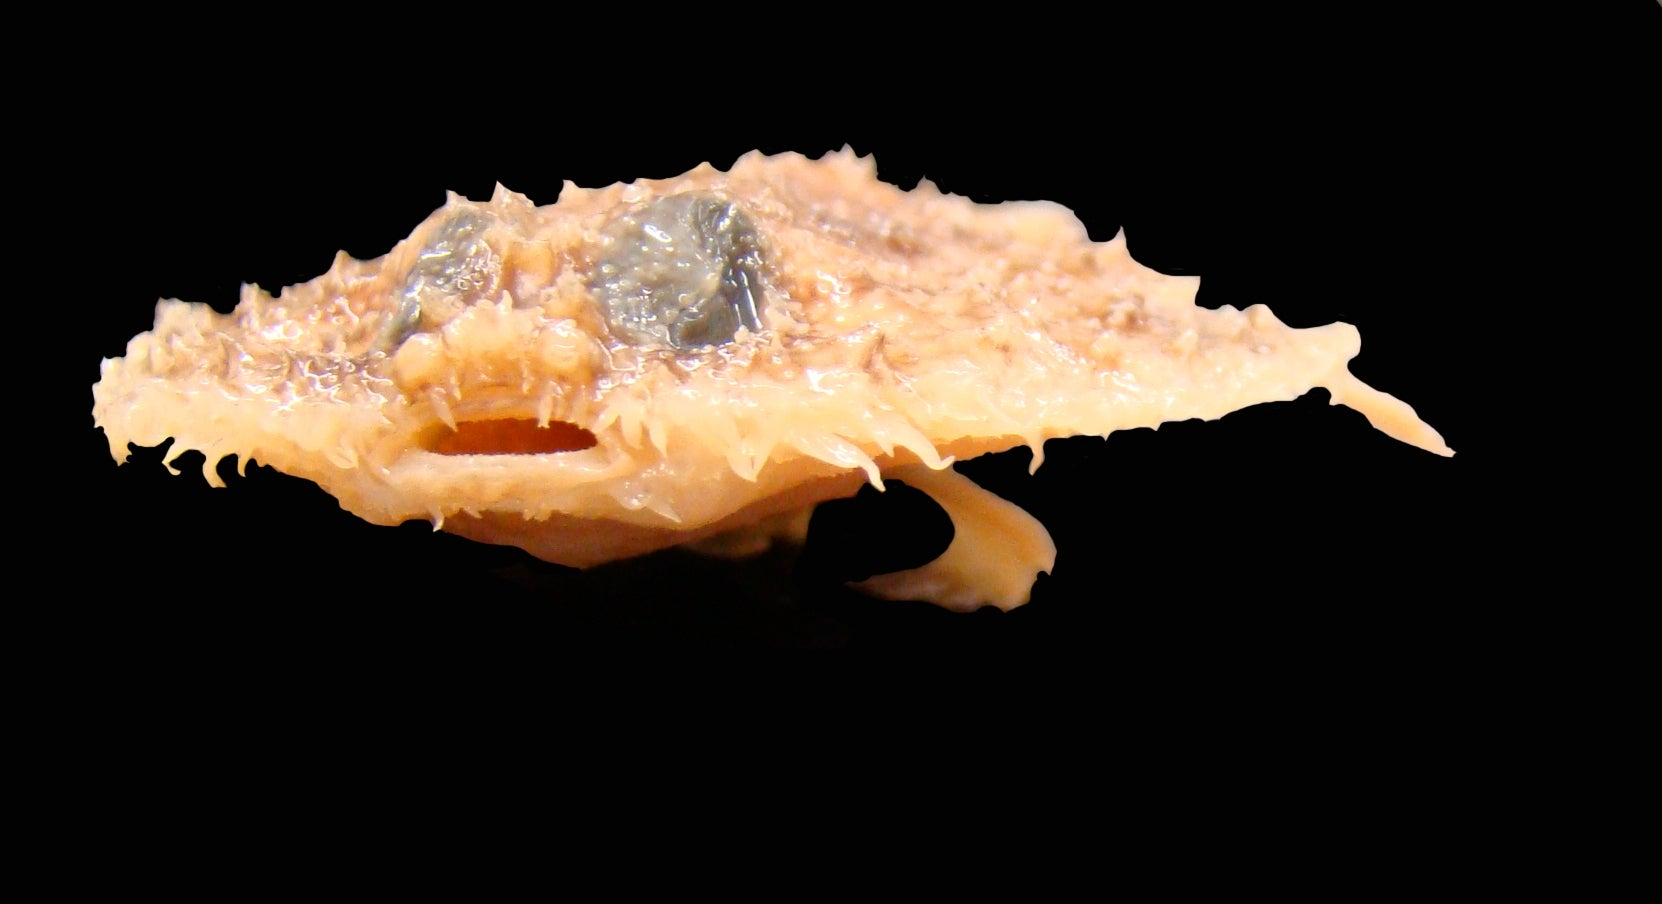 The Top 10 New Species of 2011